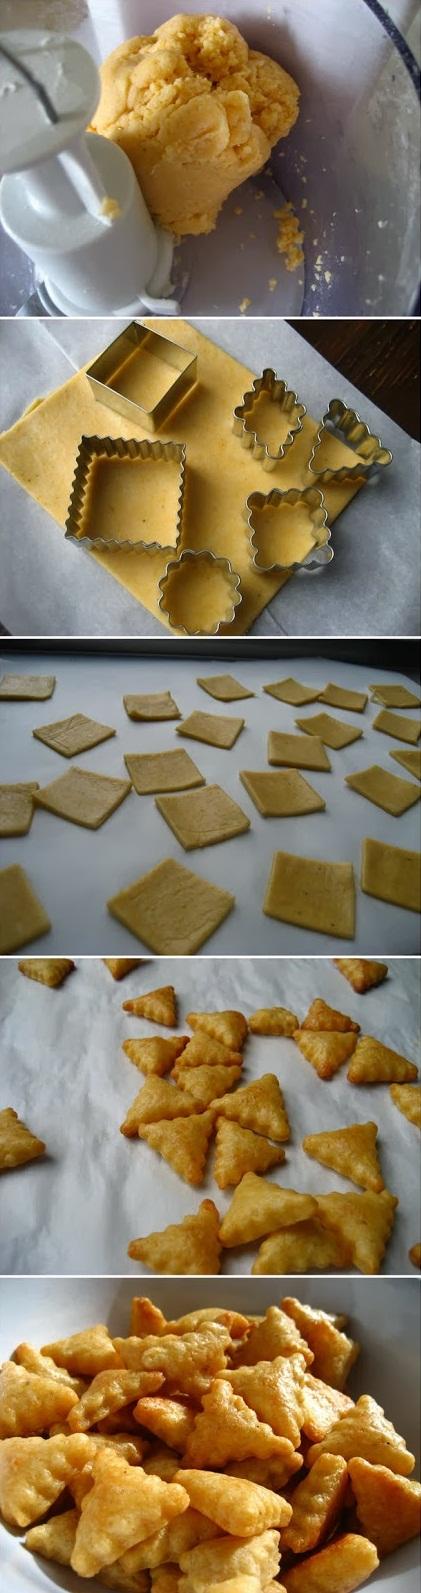 Cheddar-Crackers